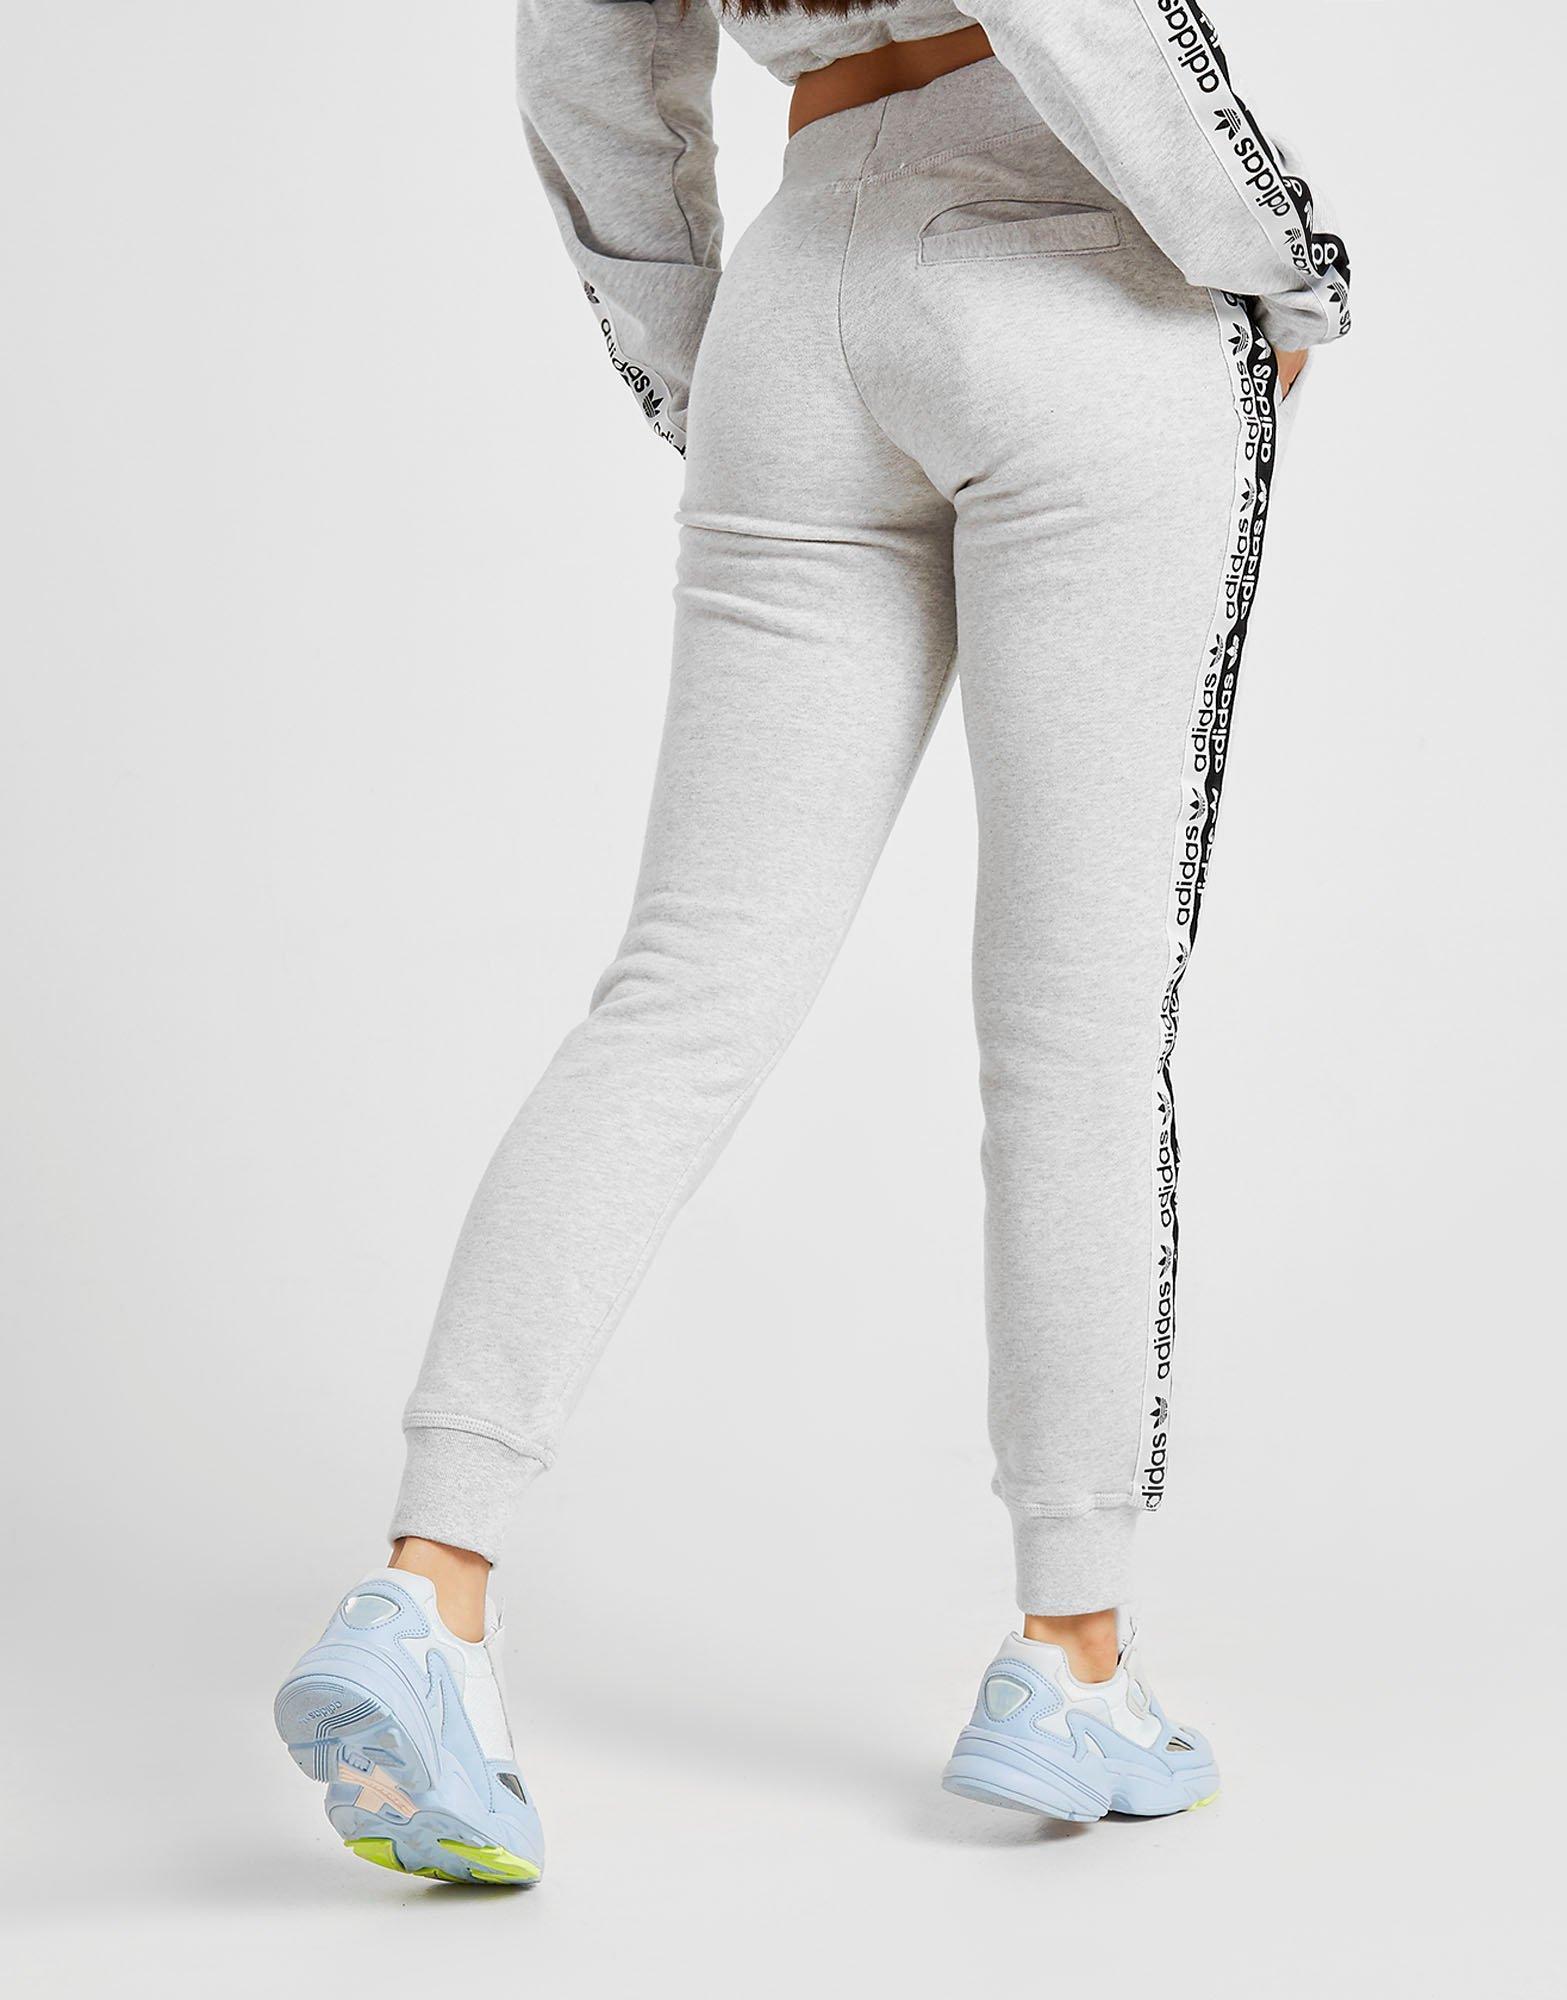 ensemble adidas gris femme